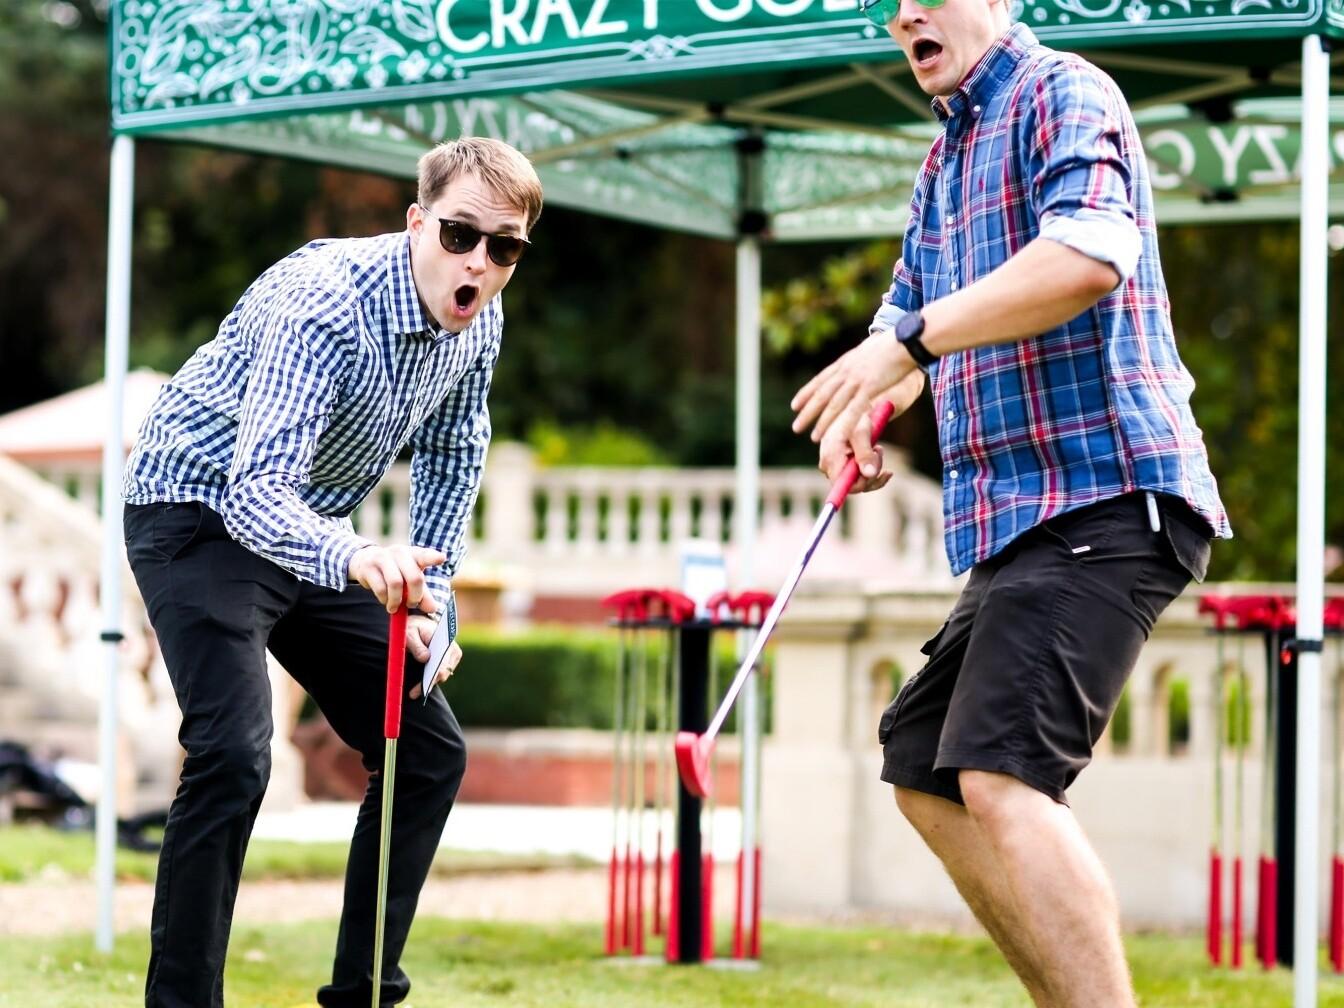 Crazy Golf AB AT Celebrations Fetcham